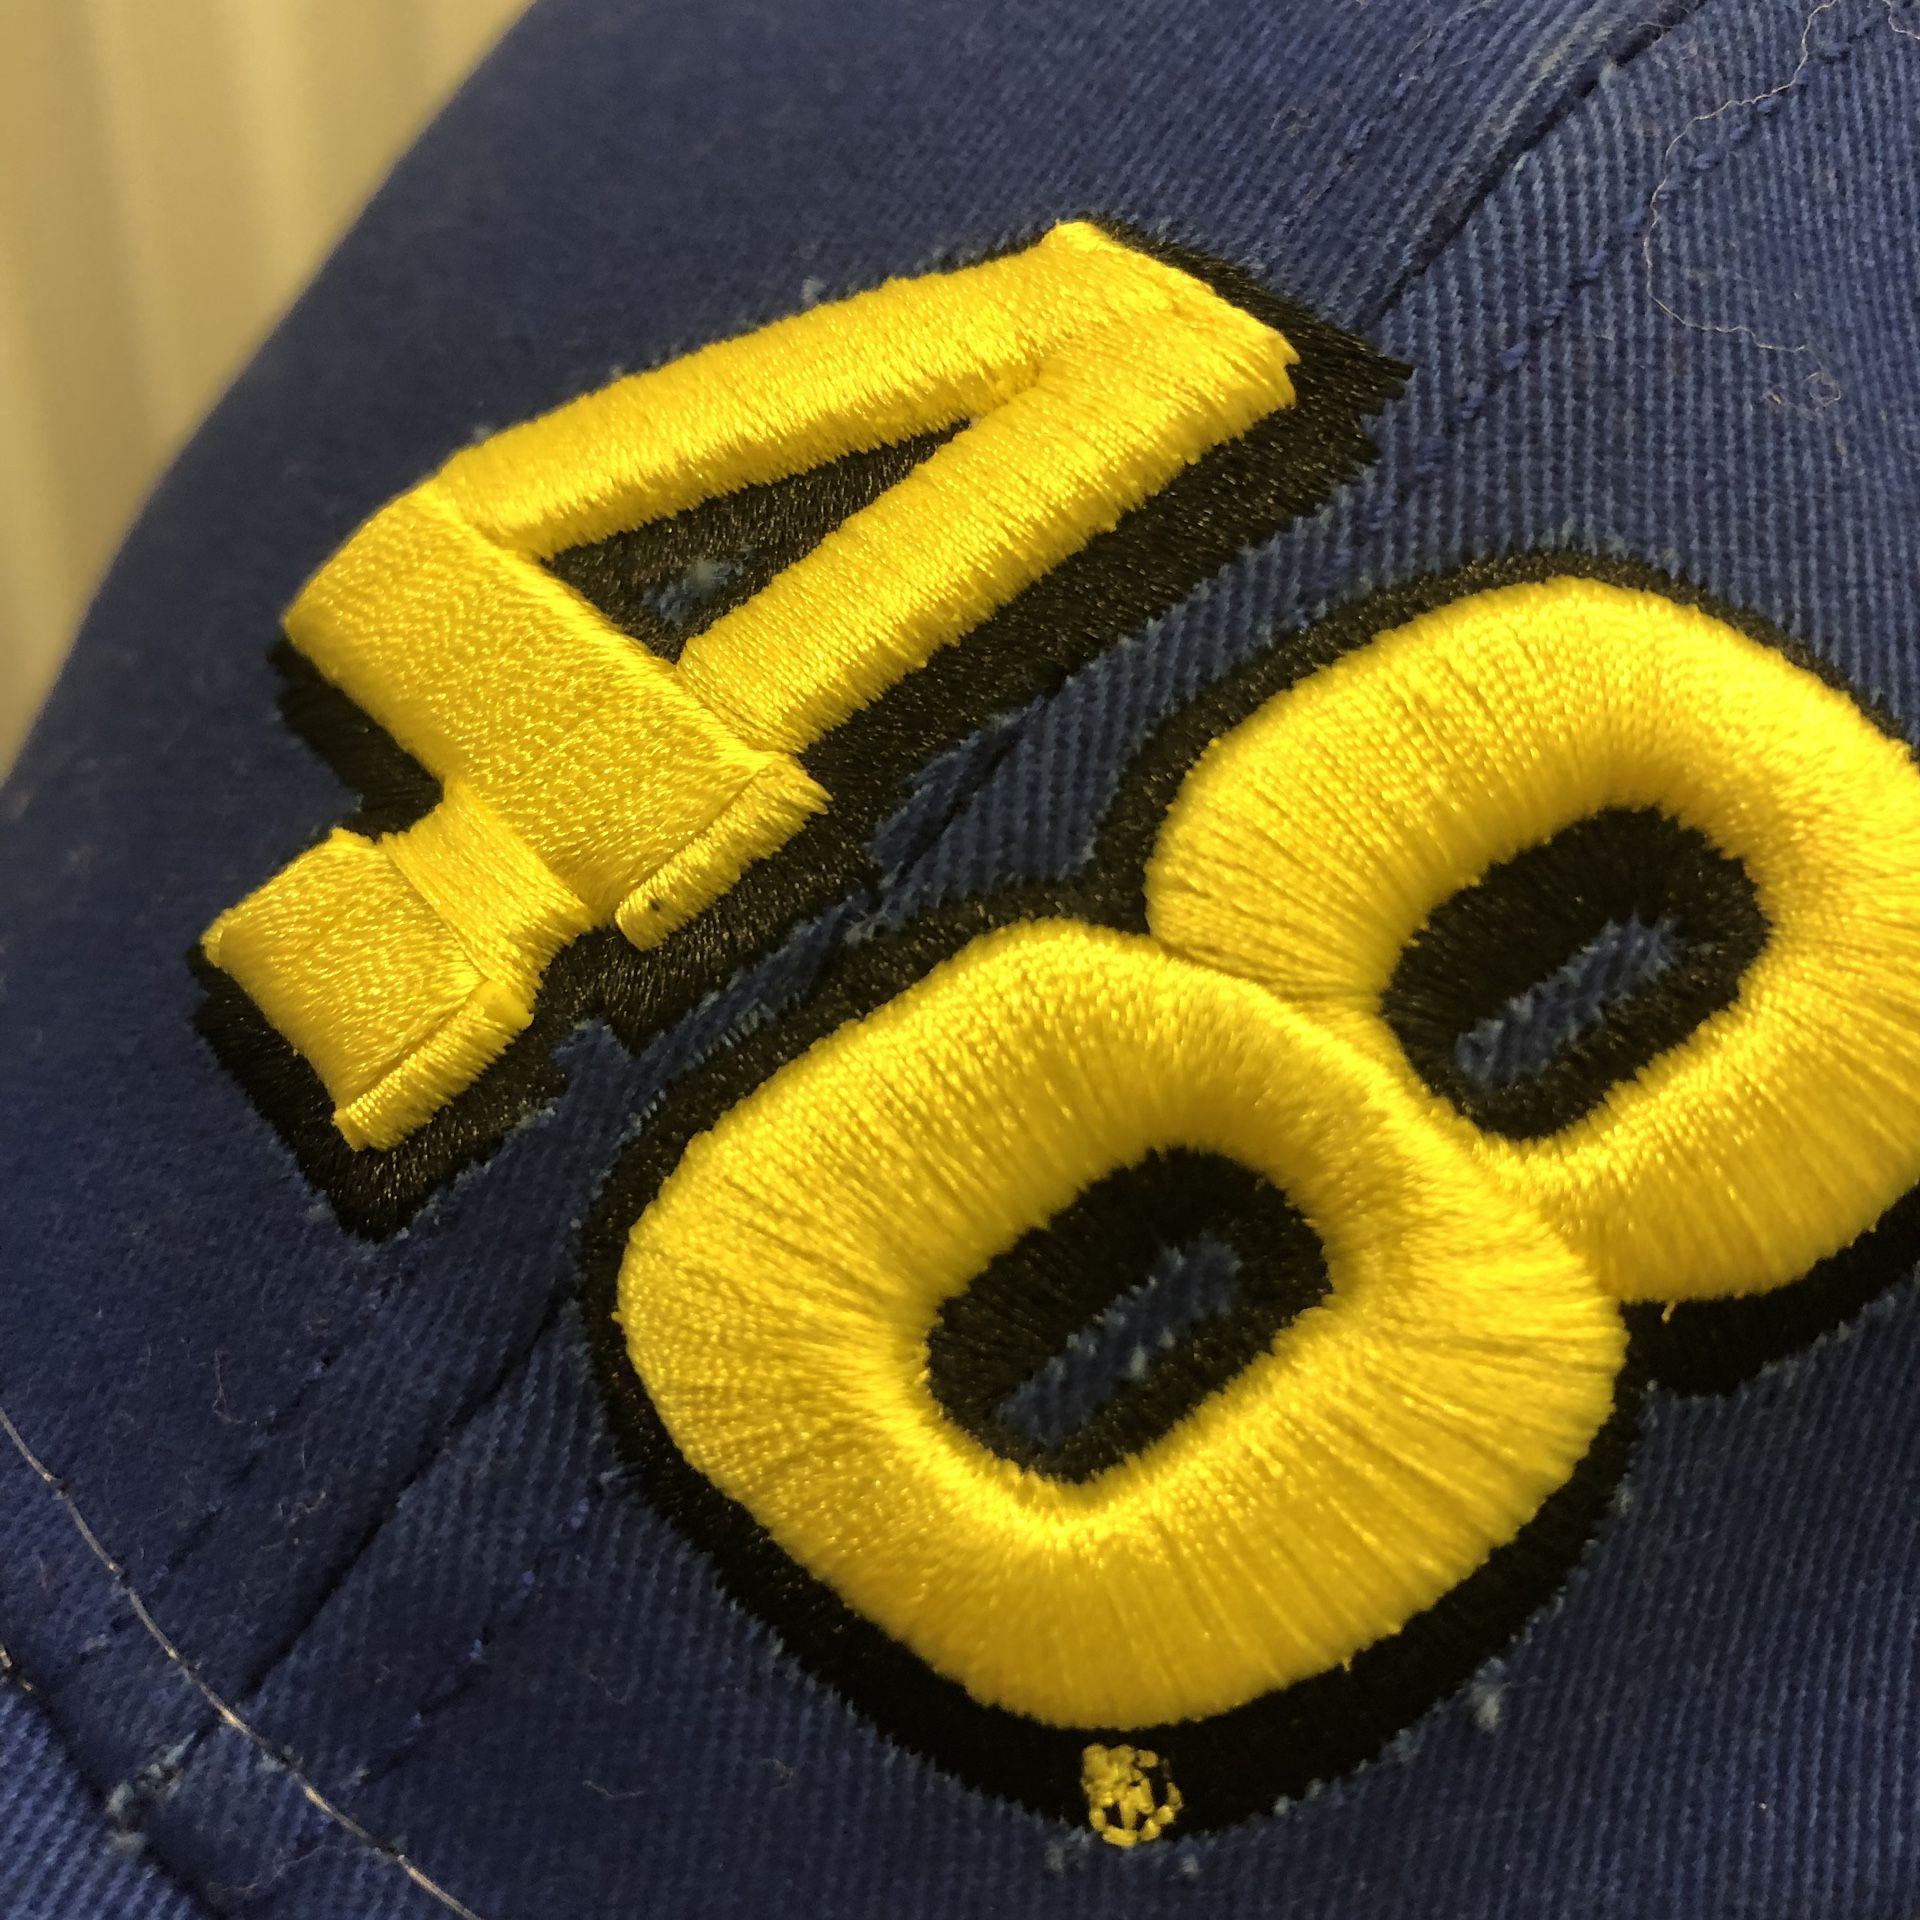 NASCAR JIMMY JOHNSON HAT